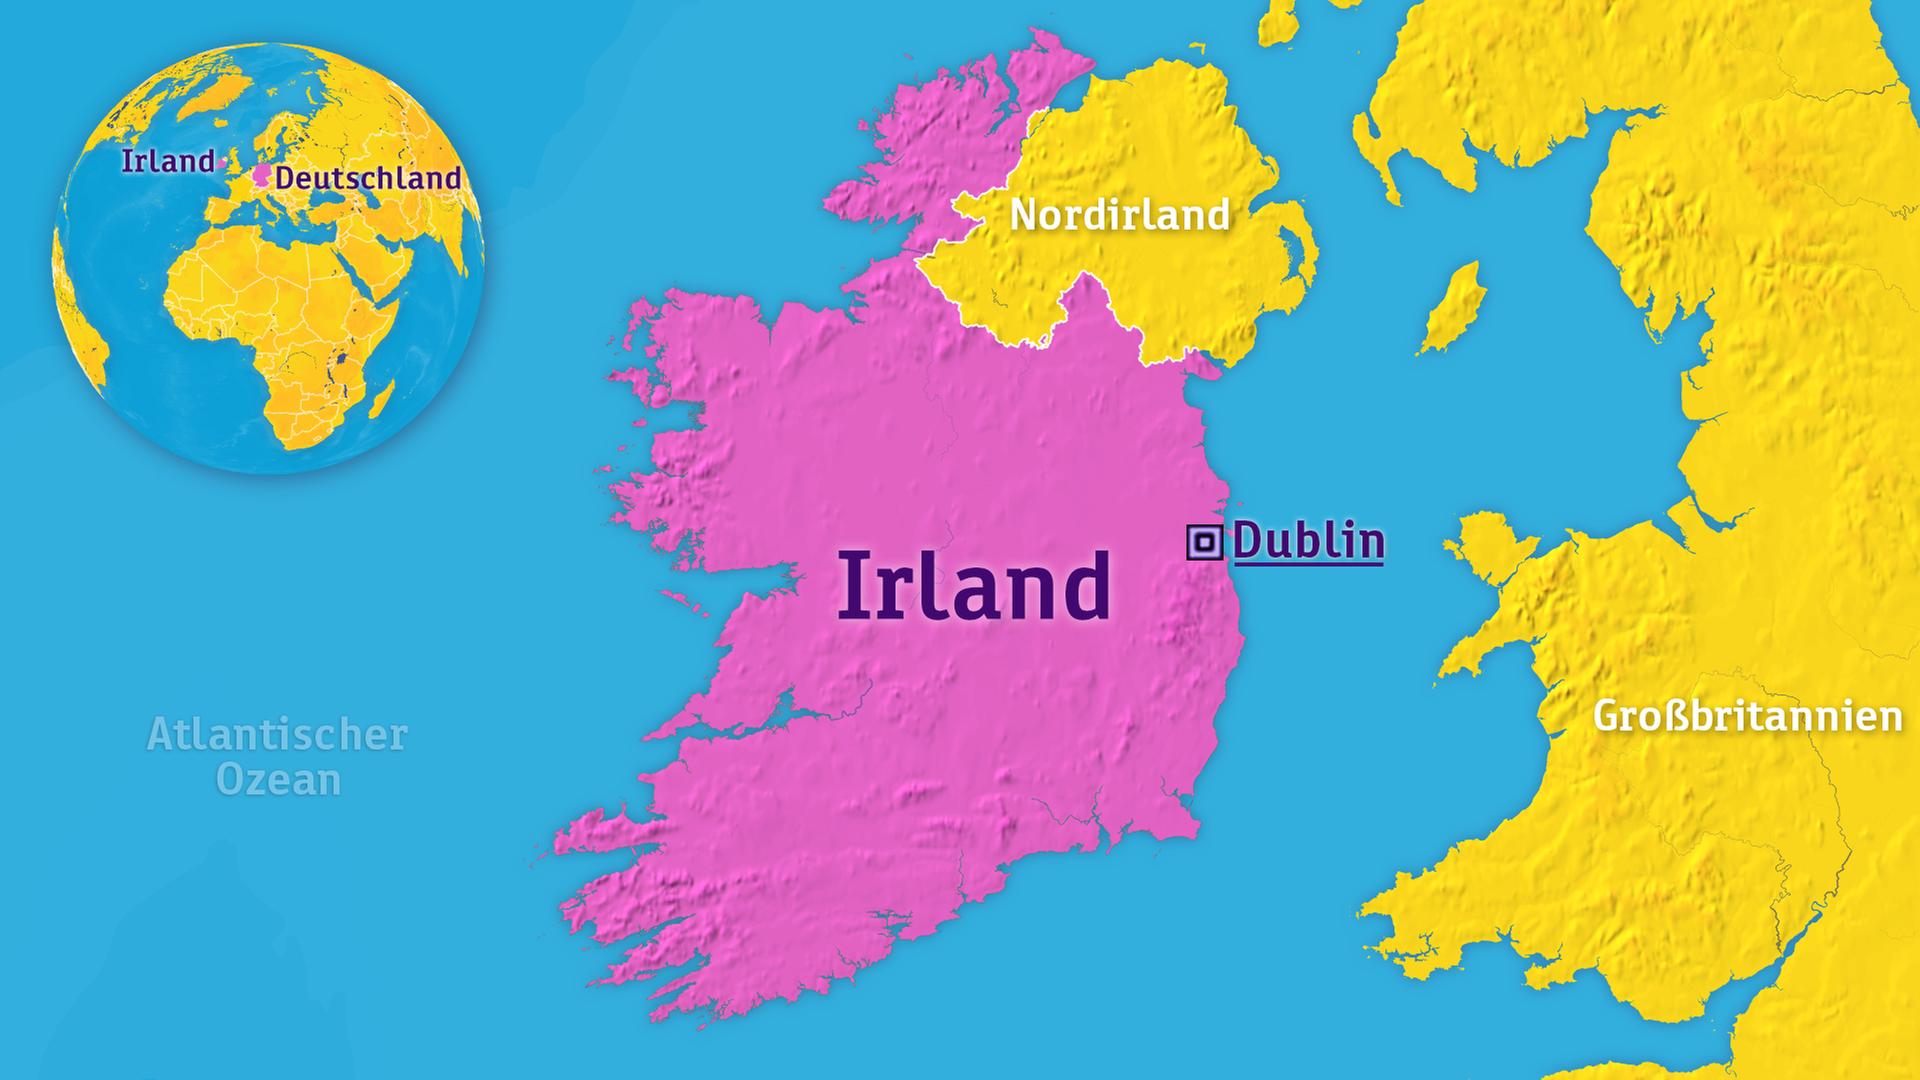 Irland Karte.Logo Irland Zdfmediathek